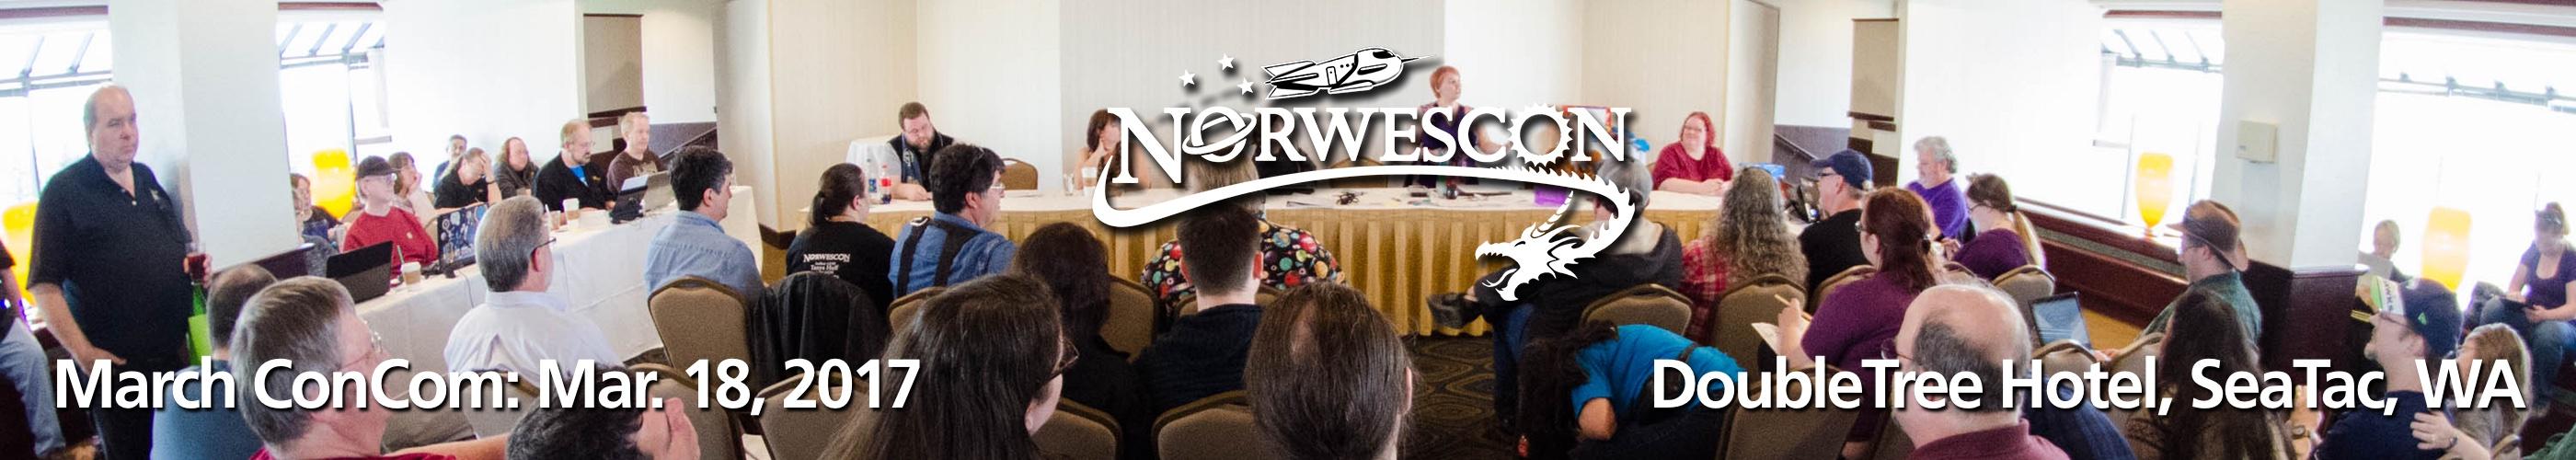 NWC40 March ConCom